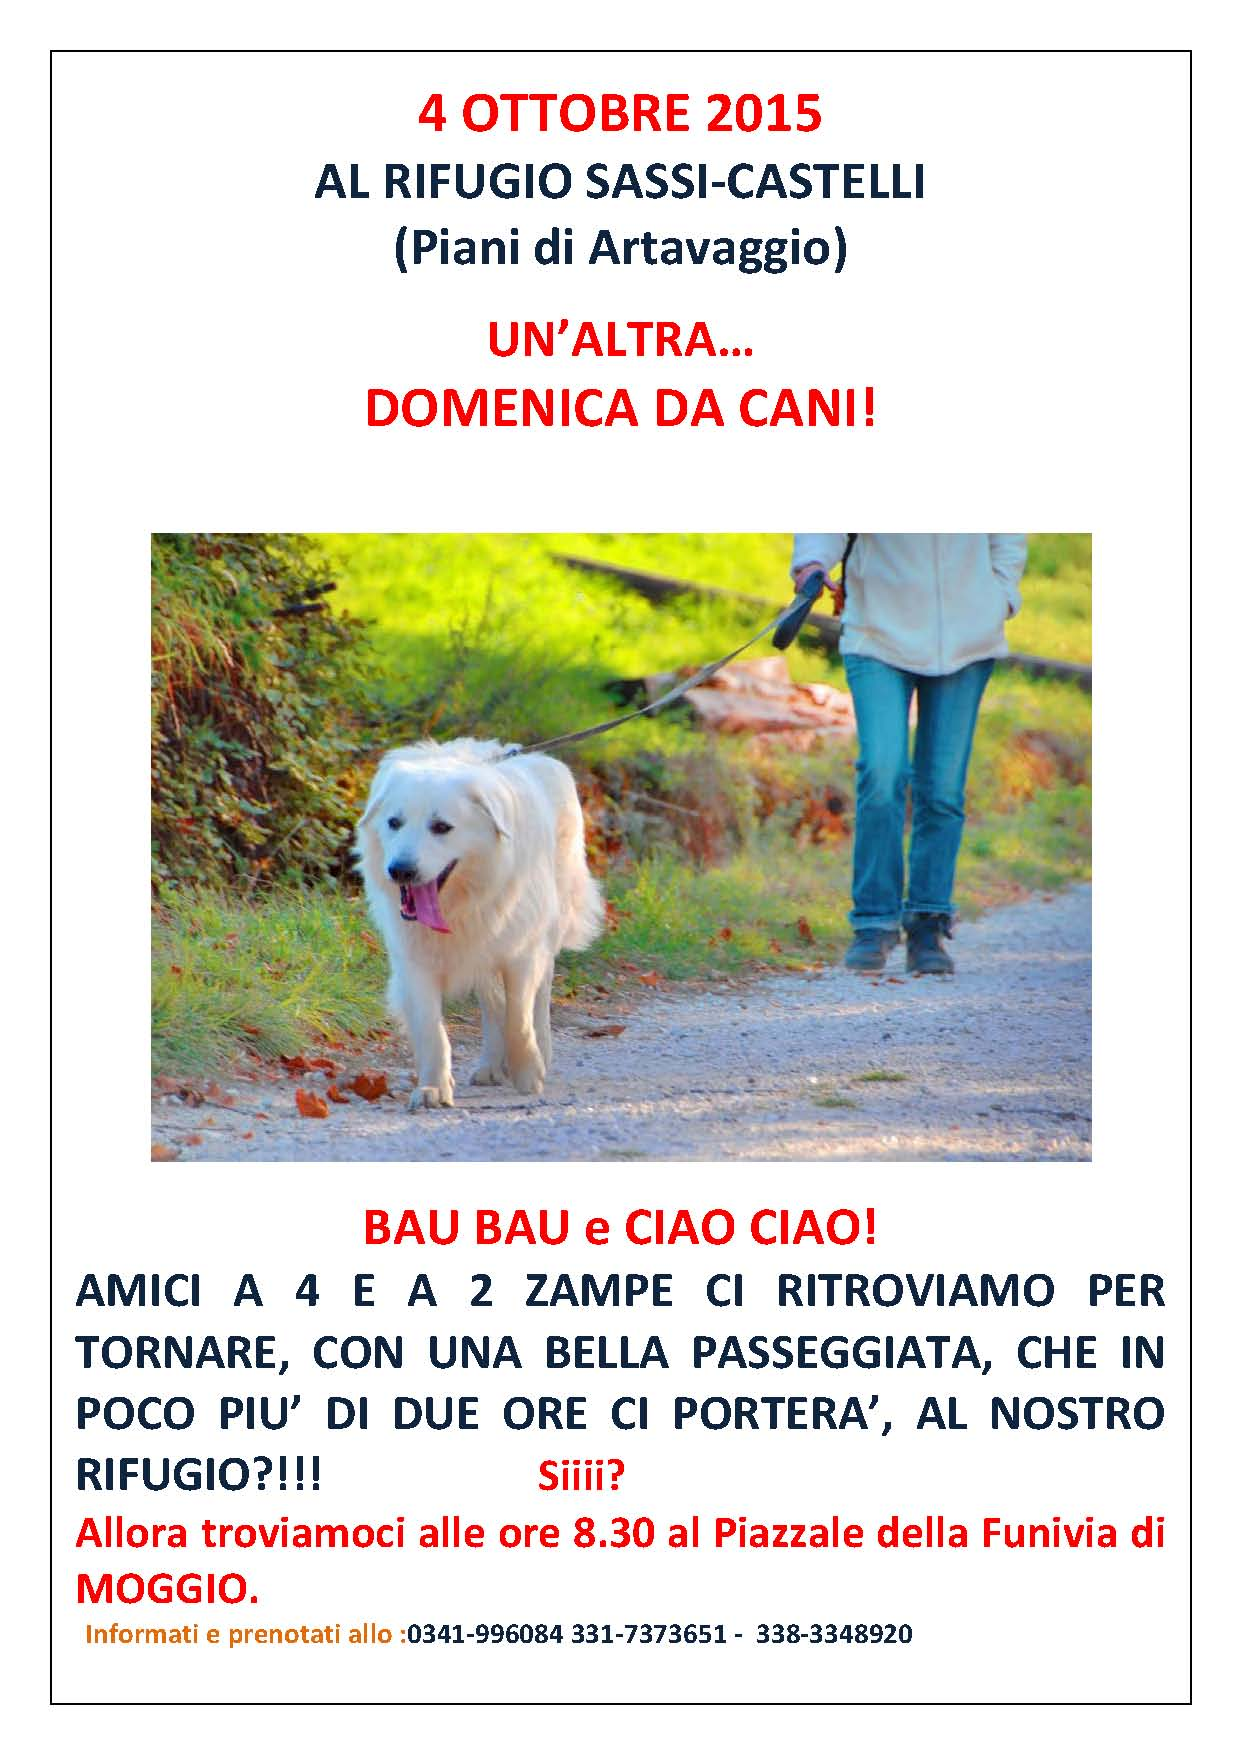 iniziative al Sassi Castelli_Pagina_2